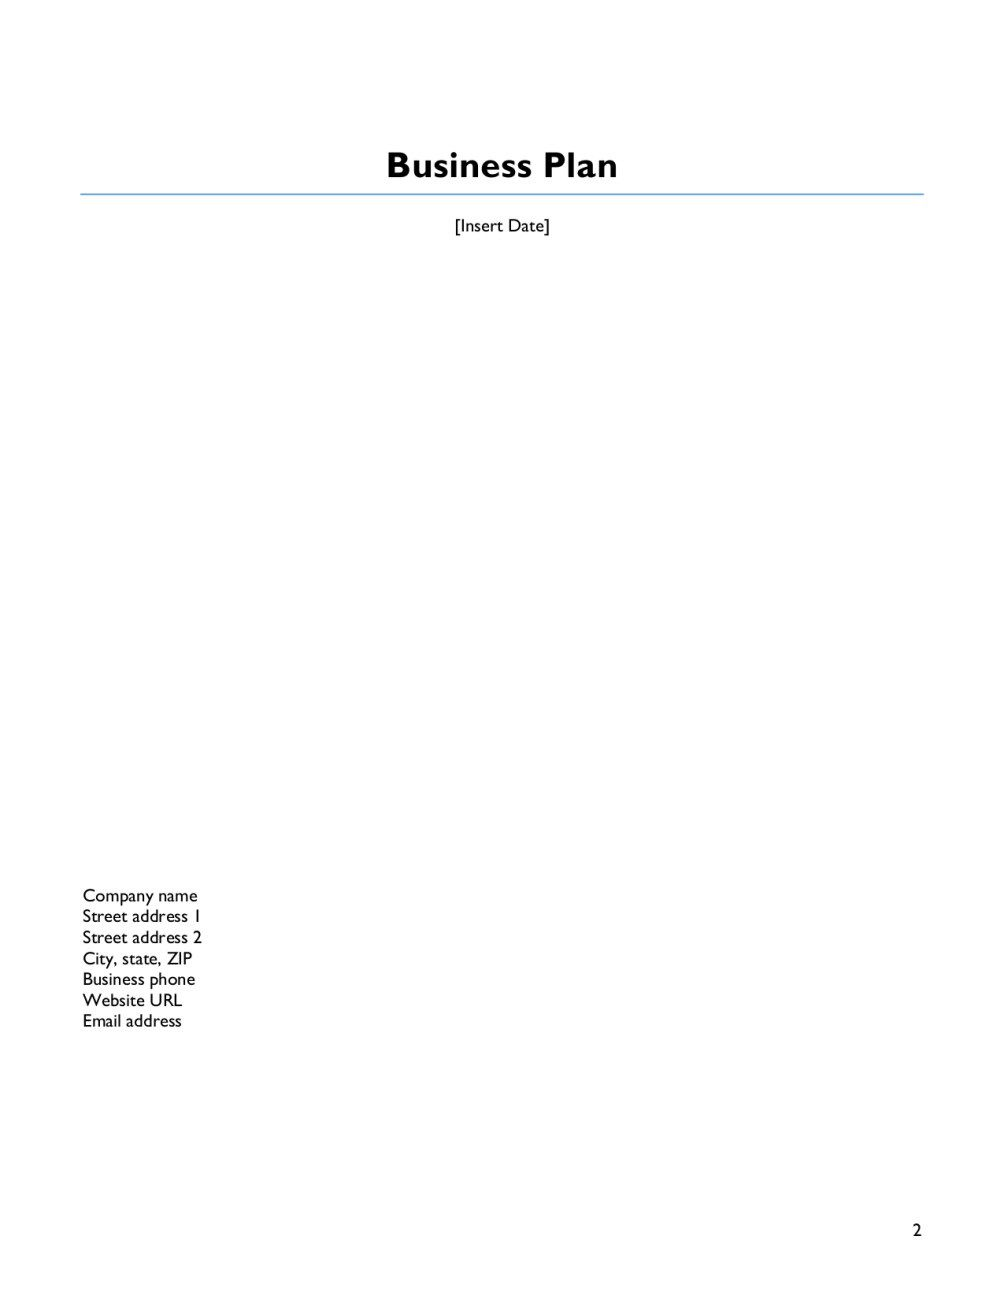 009 Astounding Score Deluxe Startup Busines Plan Template High Def  Score-deluxe-startup-business-plan-template 1.docxFull